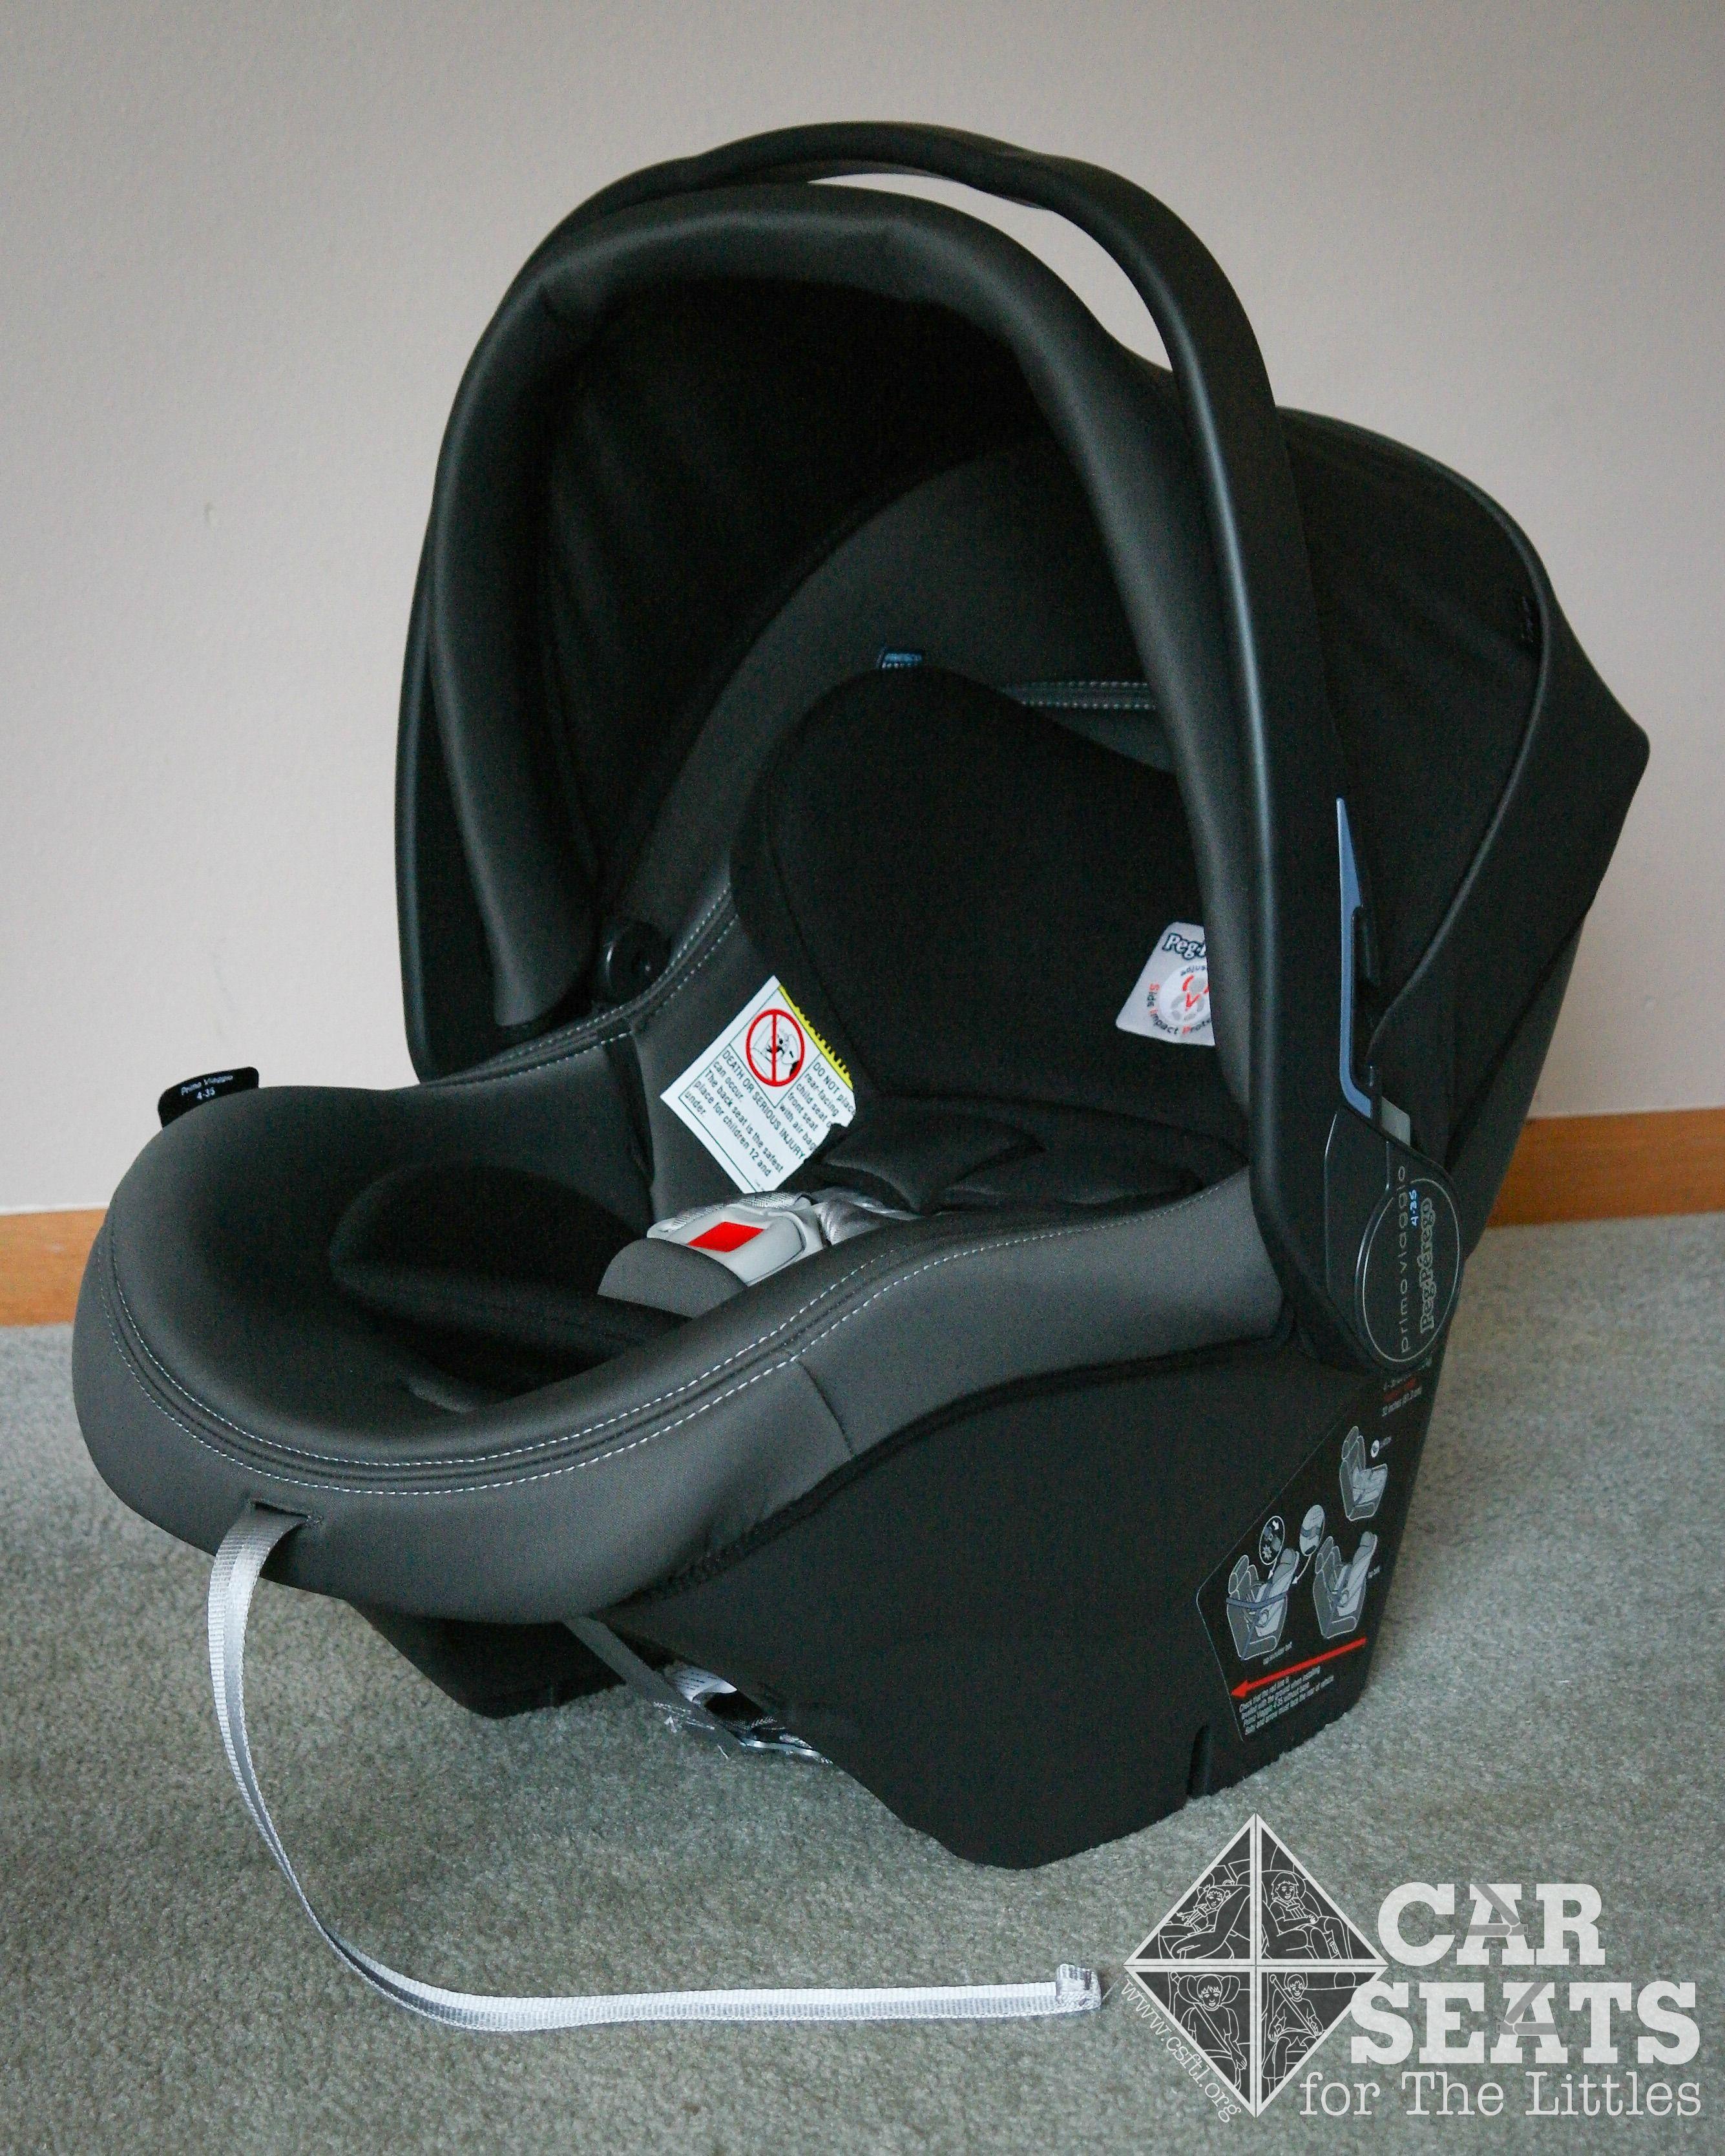 Doona Car Seat & Stroller (With images) Doona car seat